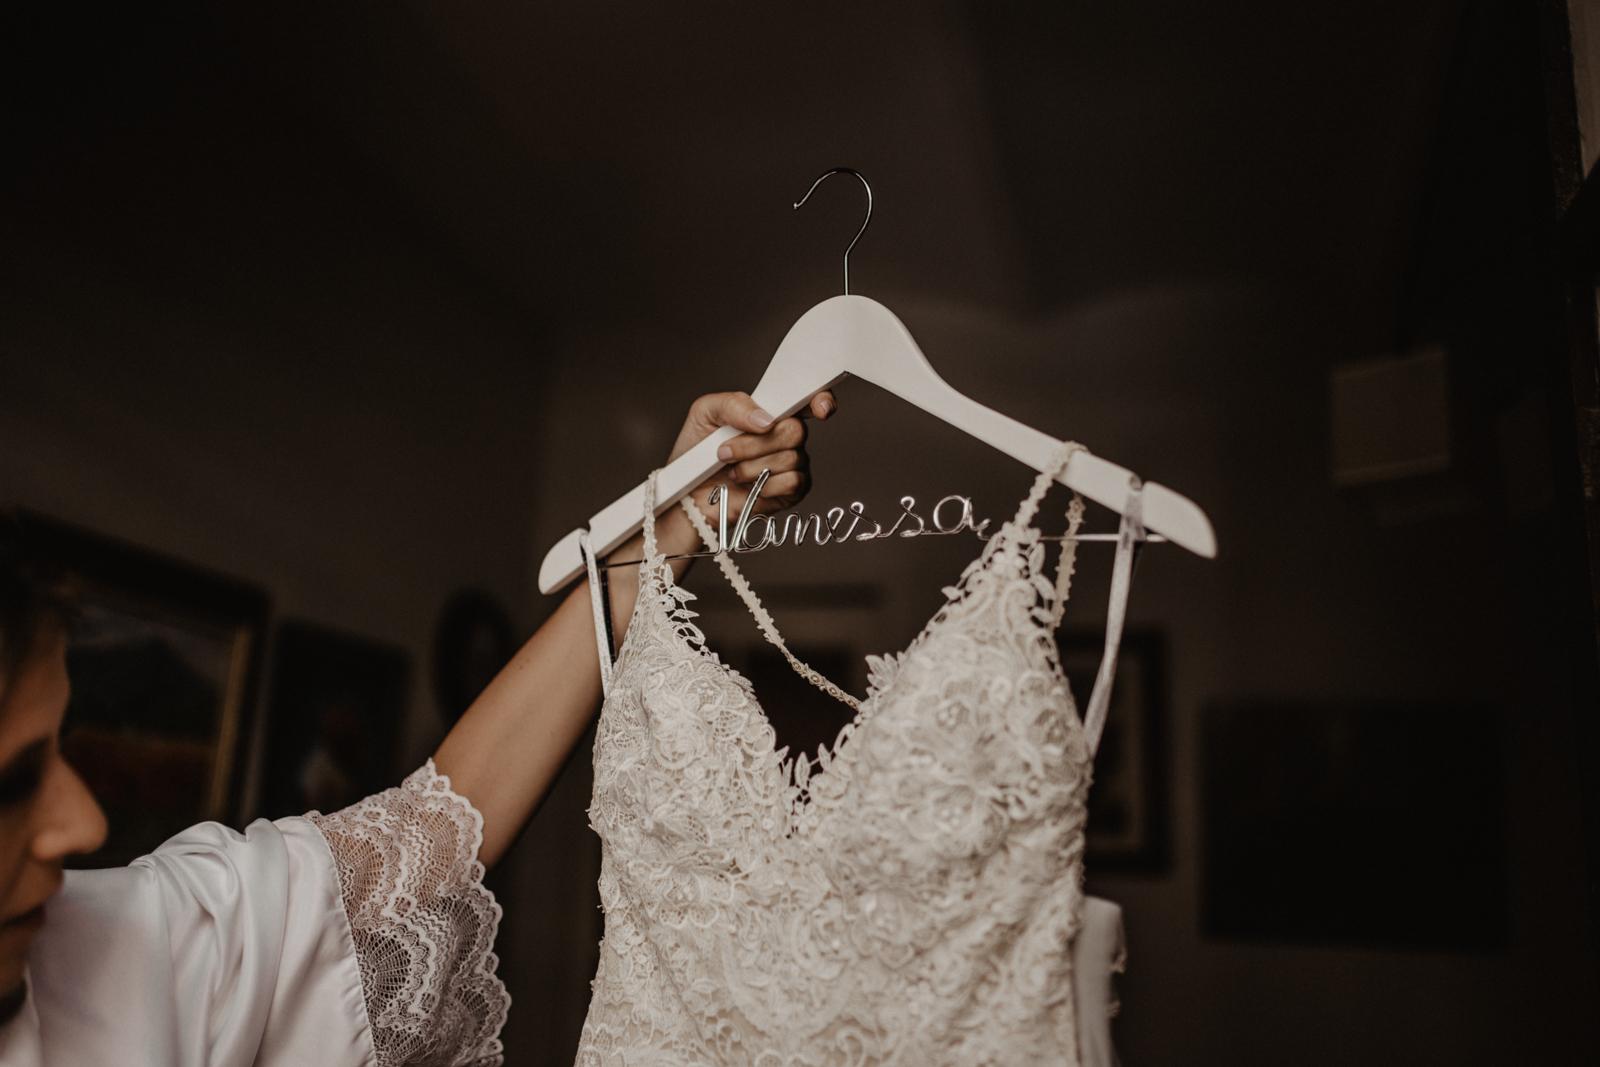 thenortherngirlphotography_photography_thenortherngirl_rebeccascabros_wedding_weddingphotography_weddingphotographer_barcelona_bodaenbarcelona_bodaenmaselmarti_bodarogeryvane-183.jpg